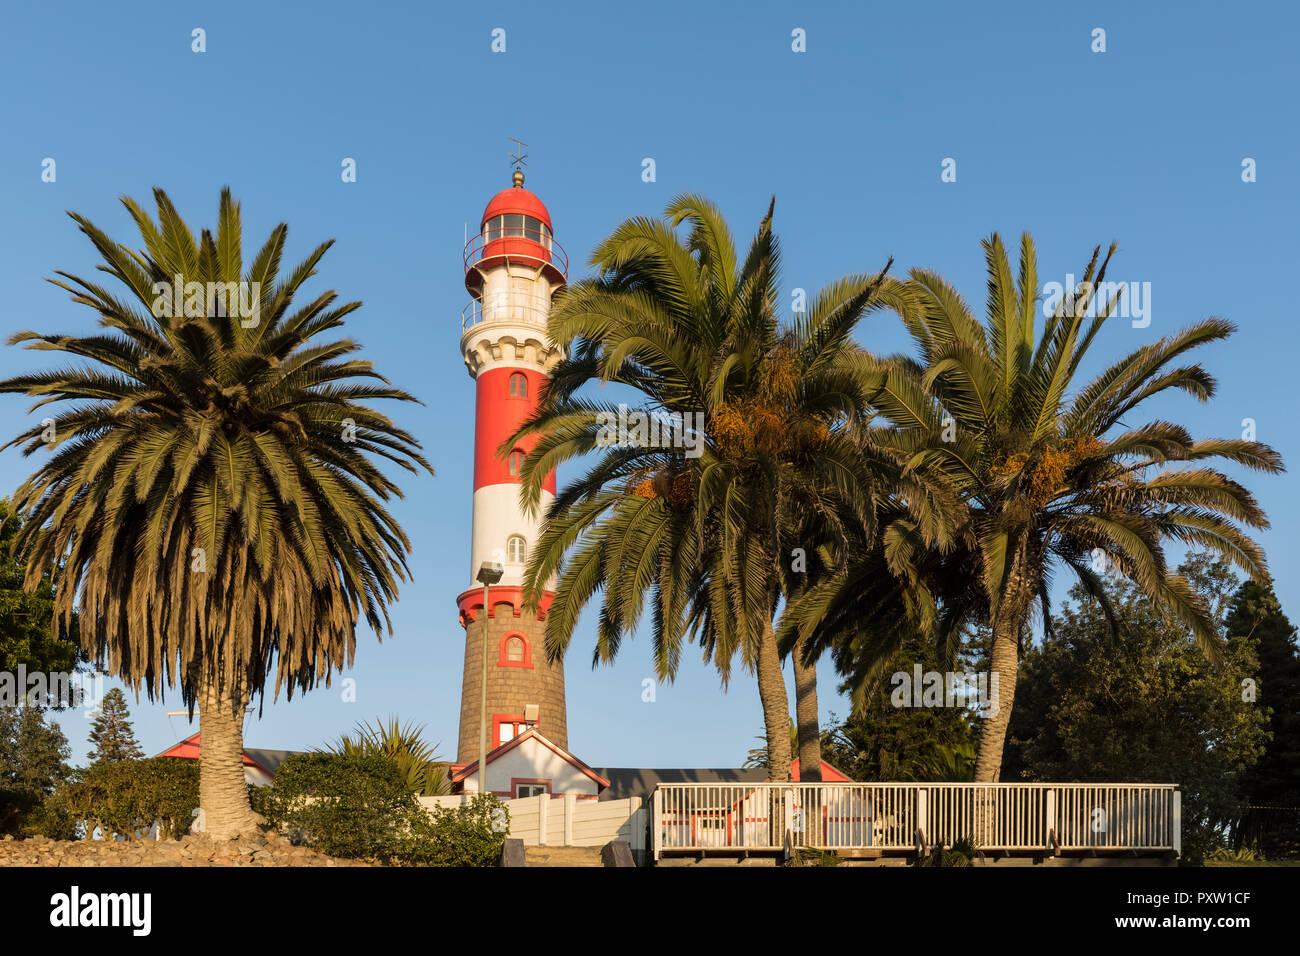 Africa, Namibia, Swakopmund, Swakopmund Lighthouse - Stock Image